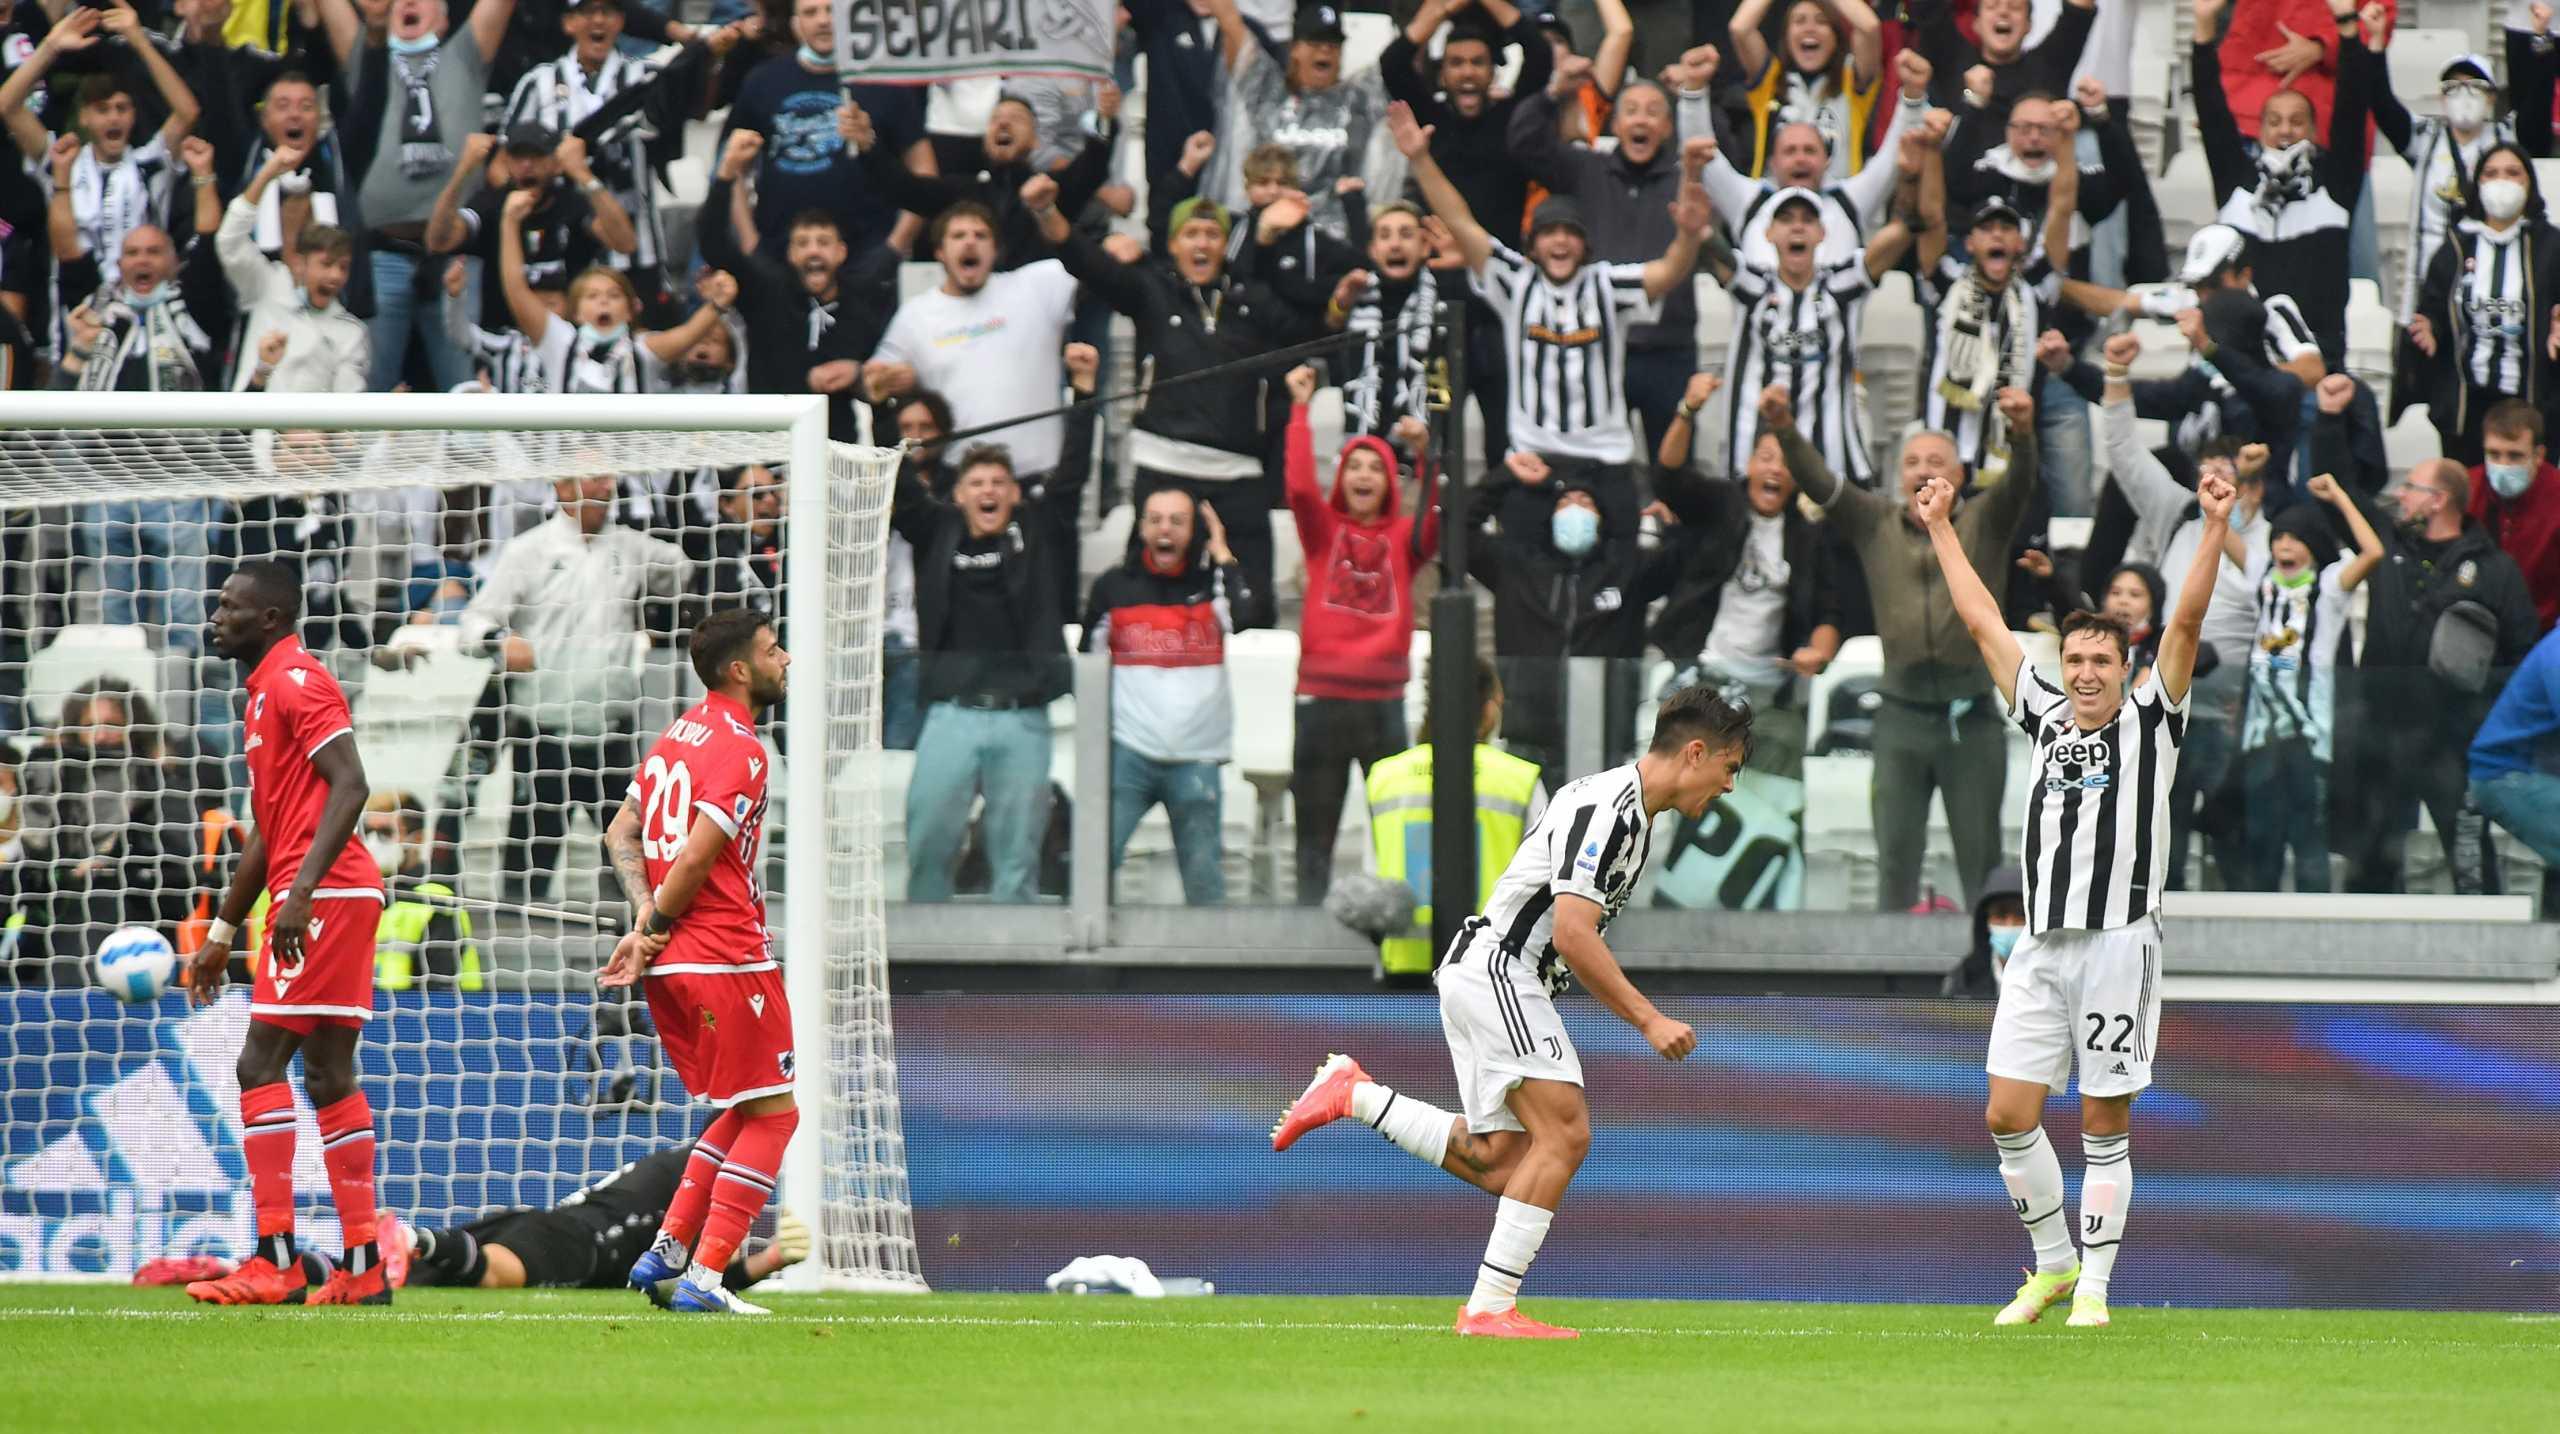 Serie A, Γιουβέντους – Σαμπντόρια 3-2: «Πύρρειος» νίκη για τη «γηραιά κυρία»